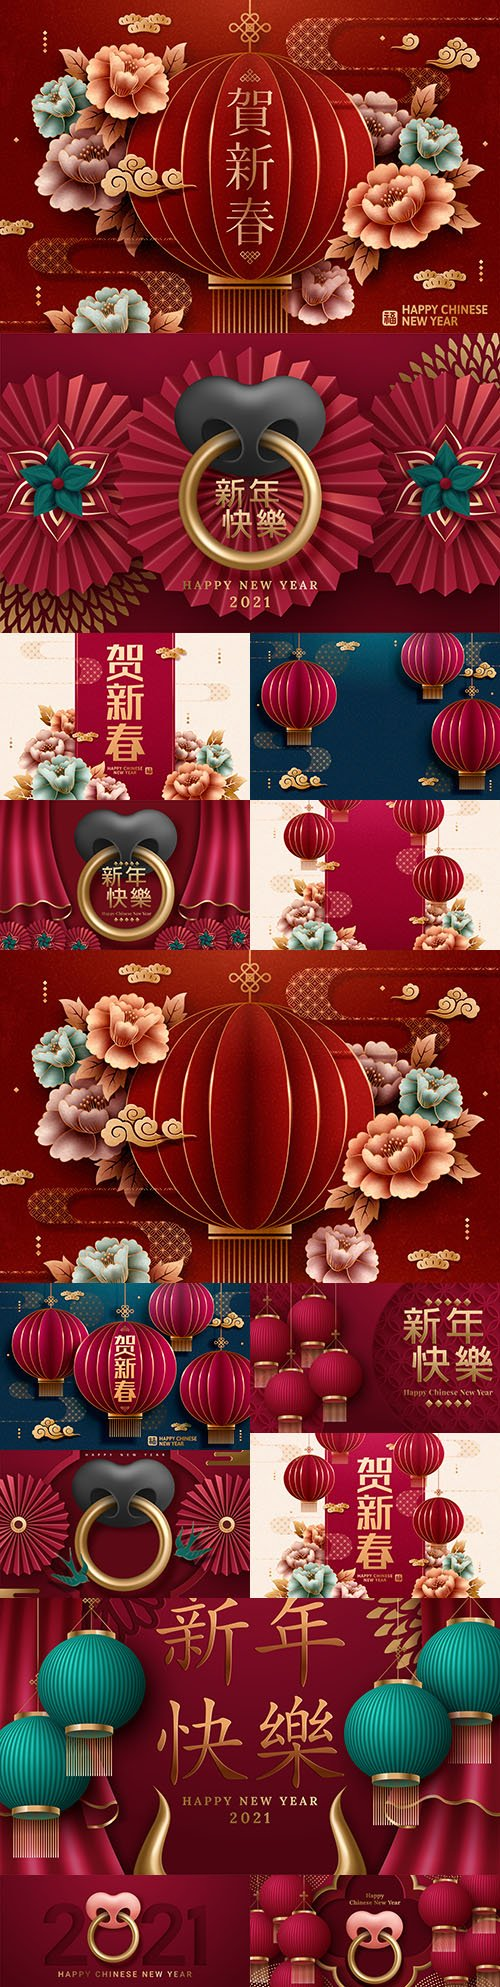 Happy Chinese New Year 2021 flower decorative design